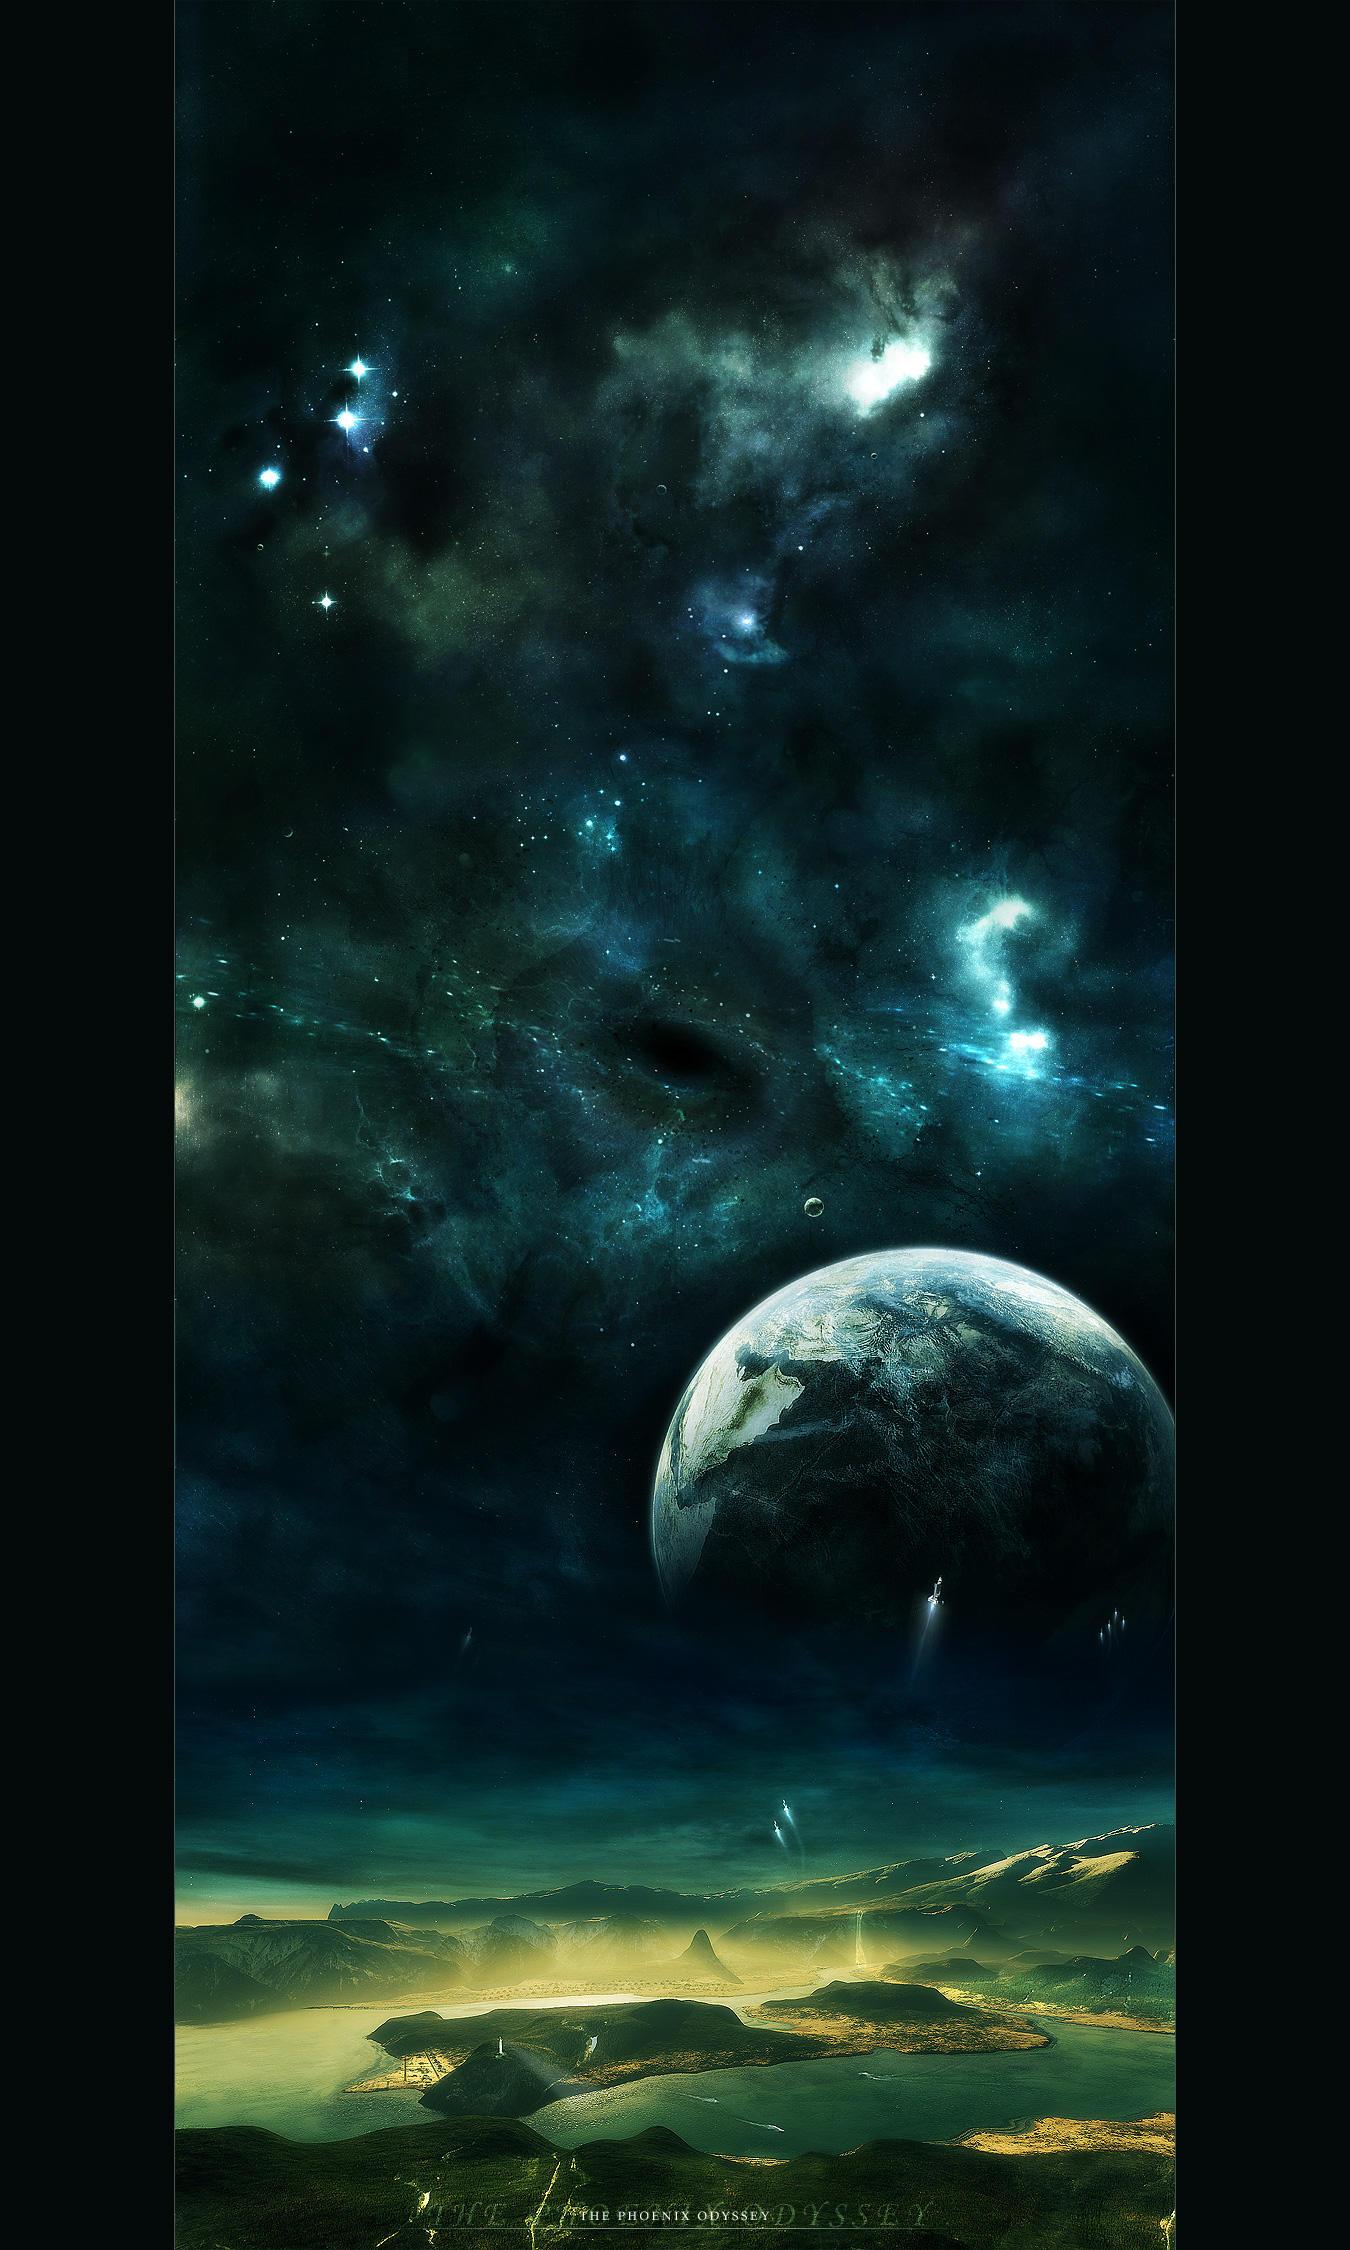 The Phoenix Odyssey by alyn